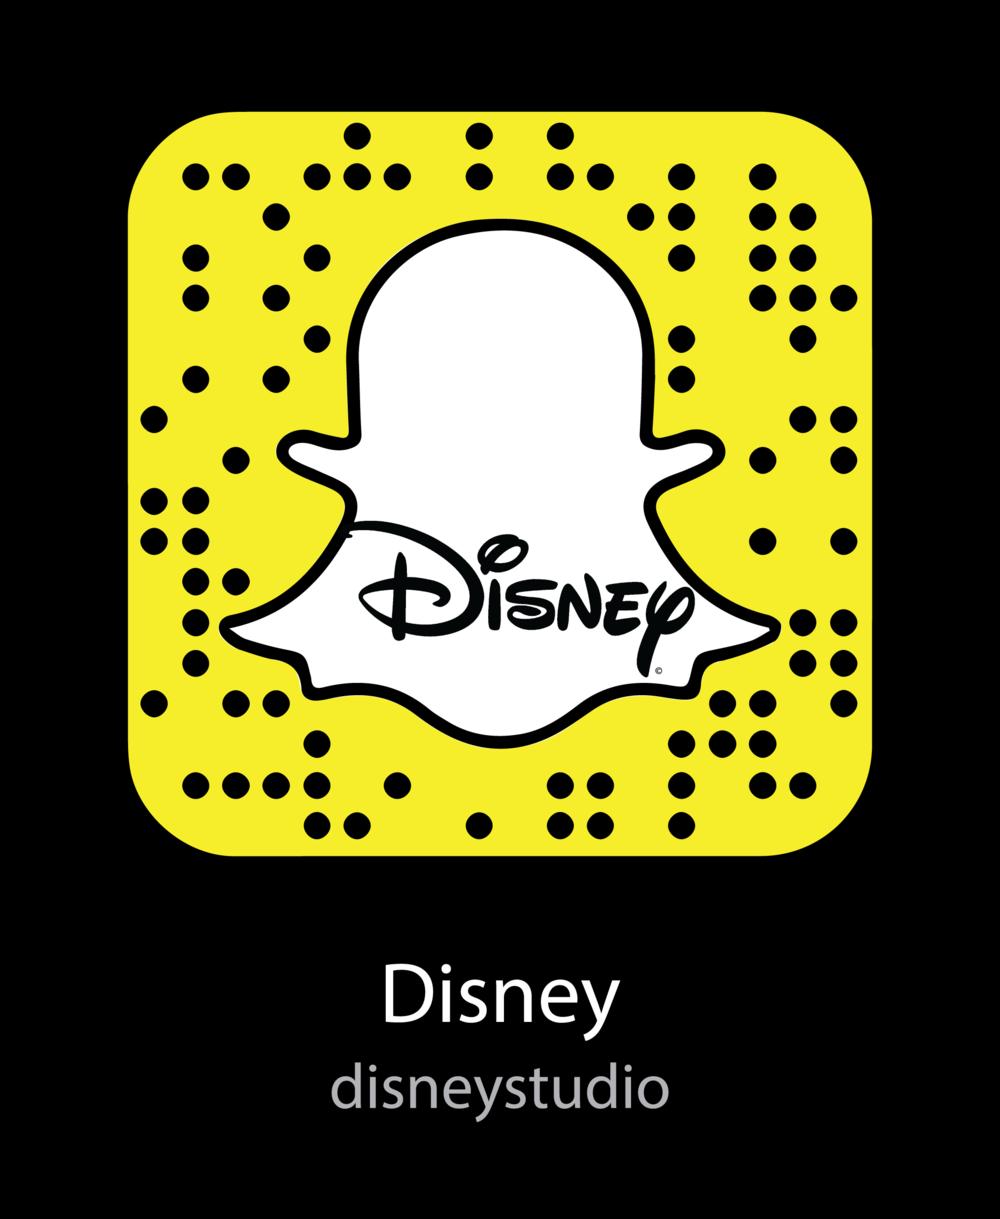 disneystudio-Brands-snapchat-snapcode.png